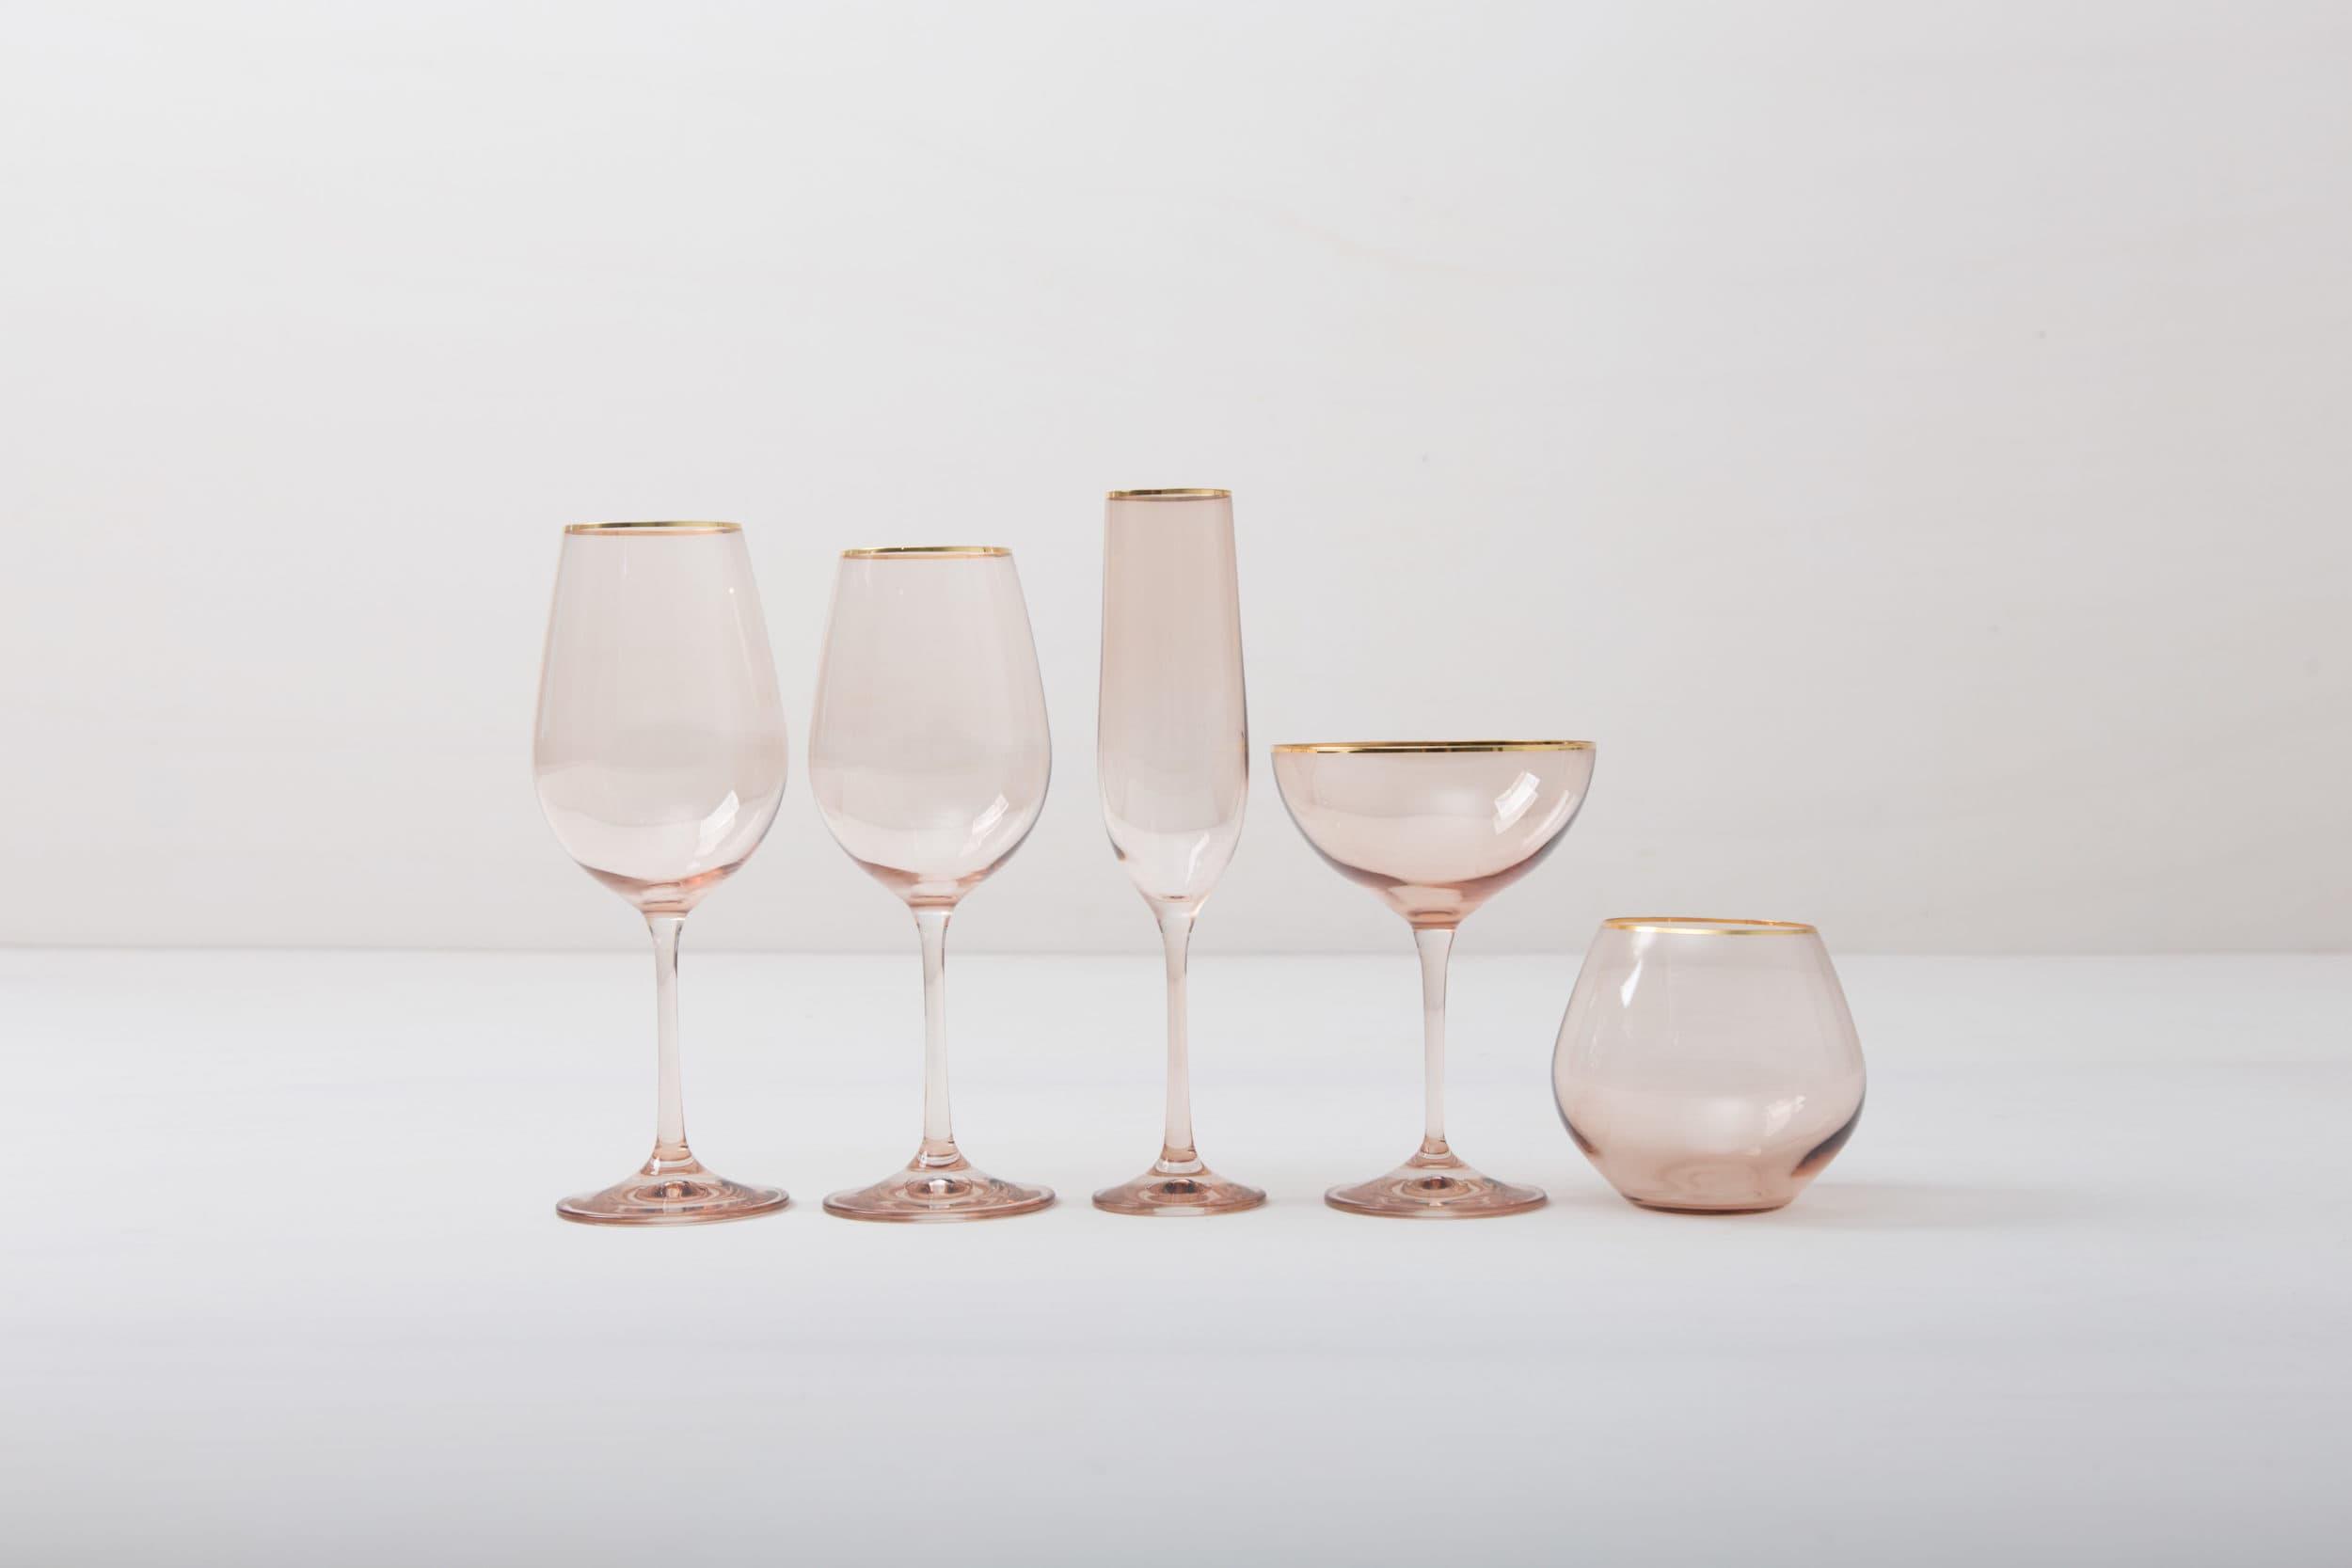 Sektglas mit Goldrand mieten, Hamburg, Berlin, Köln